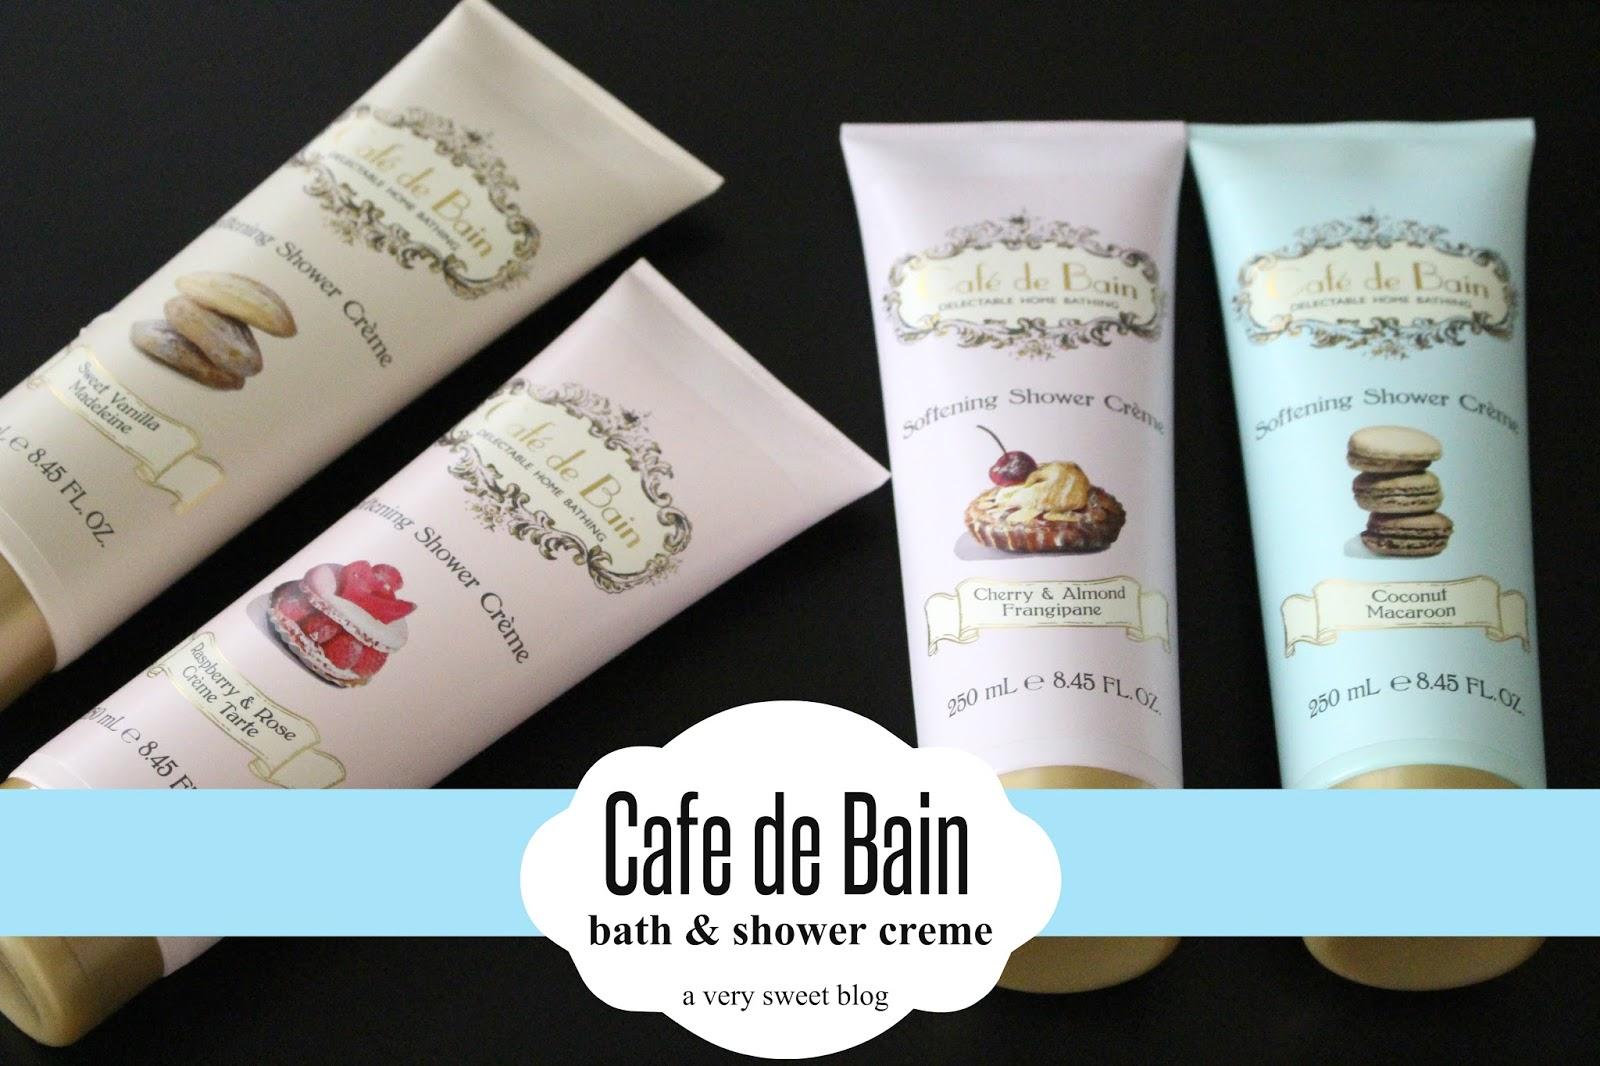 Cafe de Bain Bath & Shower Creme Review | A Very Sweet Blog